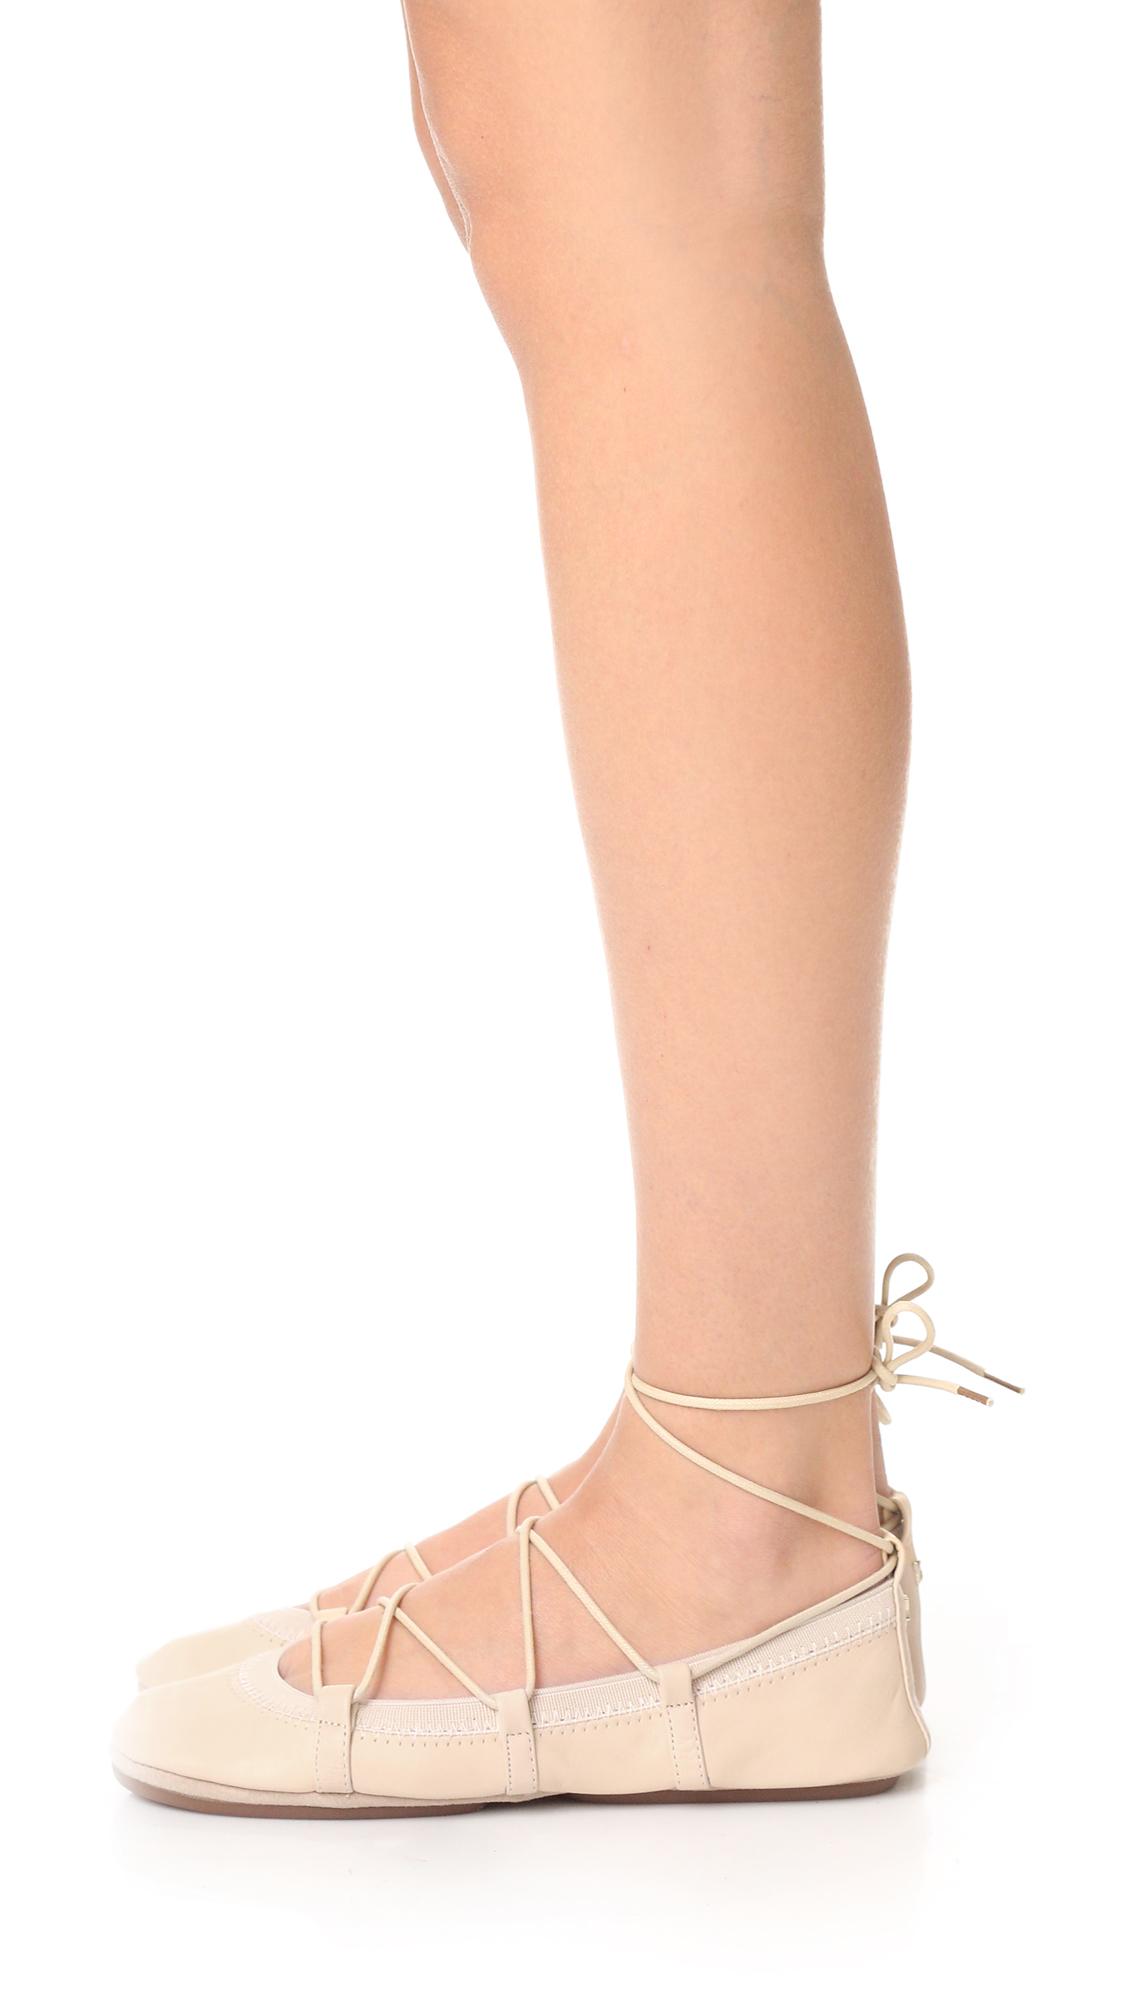 Yosi Samra Chaussures À Lacets 1Wr3SH1E